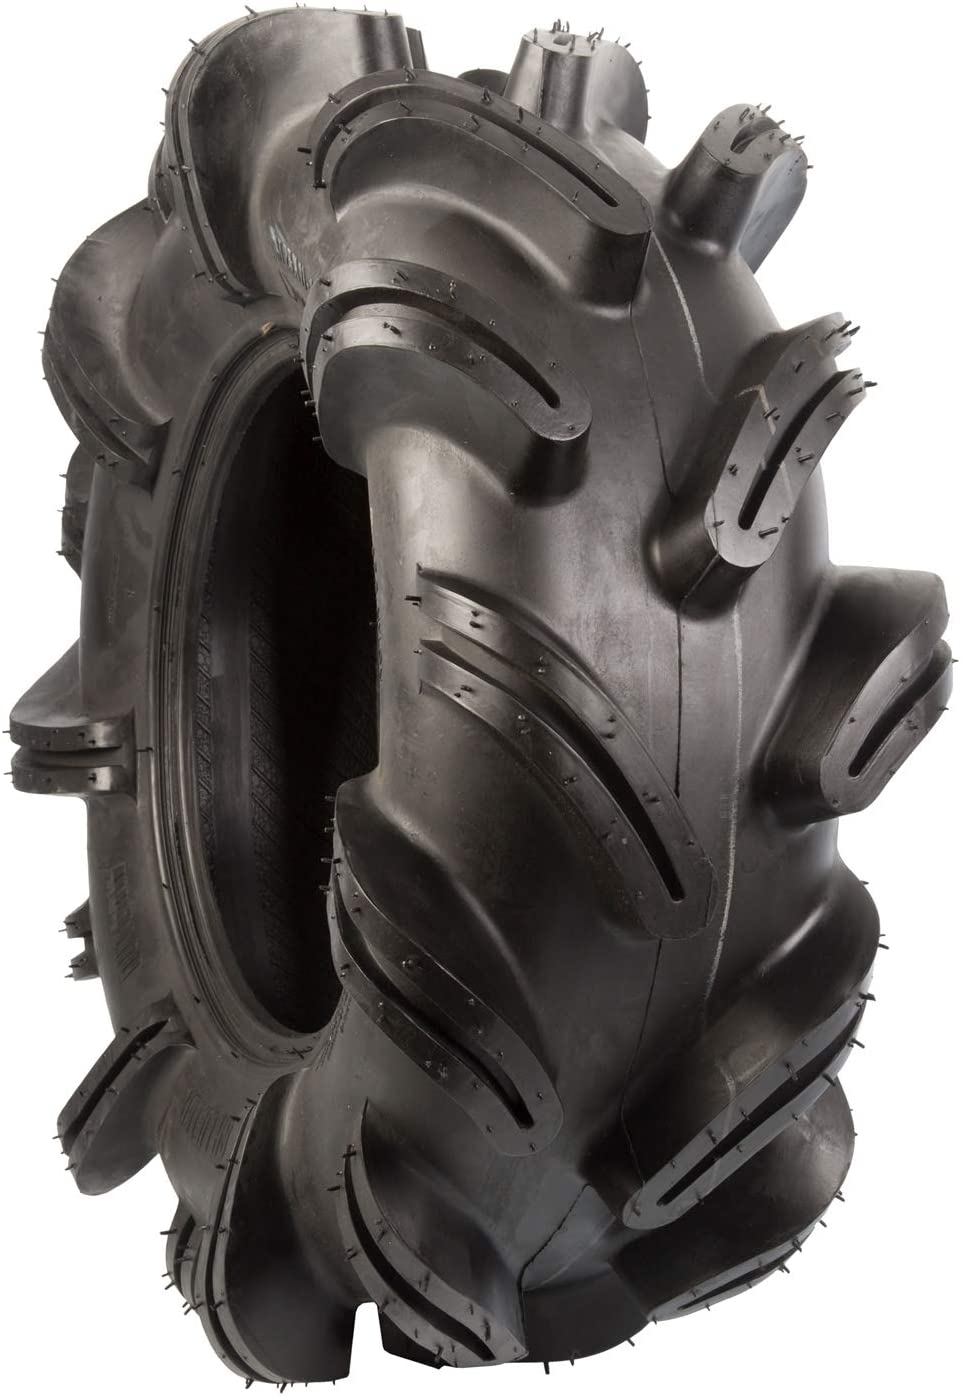 Polaris RZR 900 1000 Highlifter Outlaw 2 Tire 29.5x9.5x14